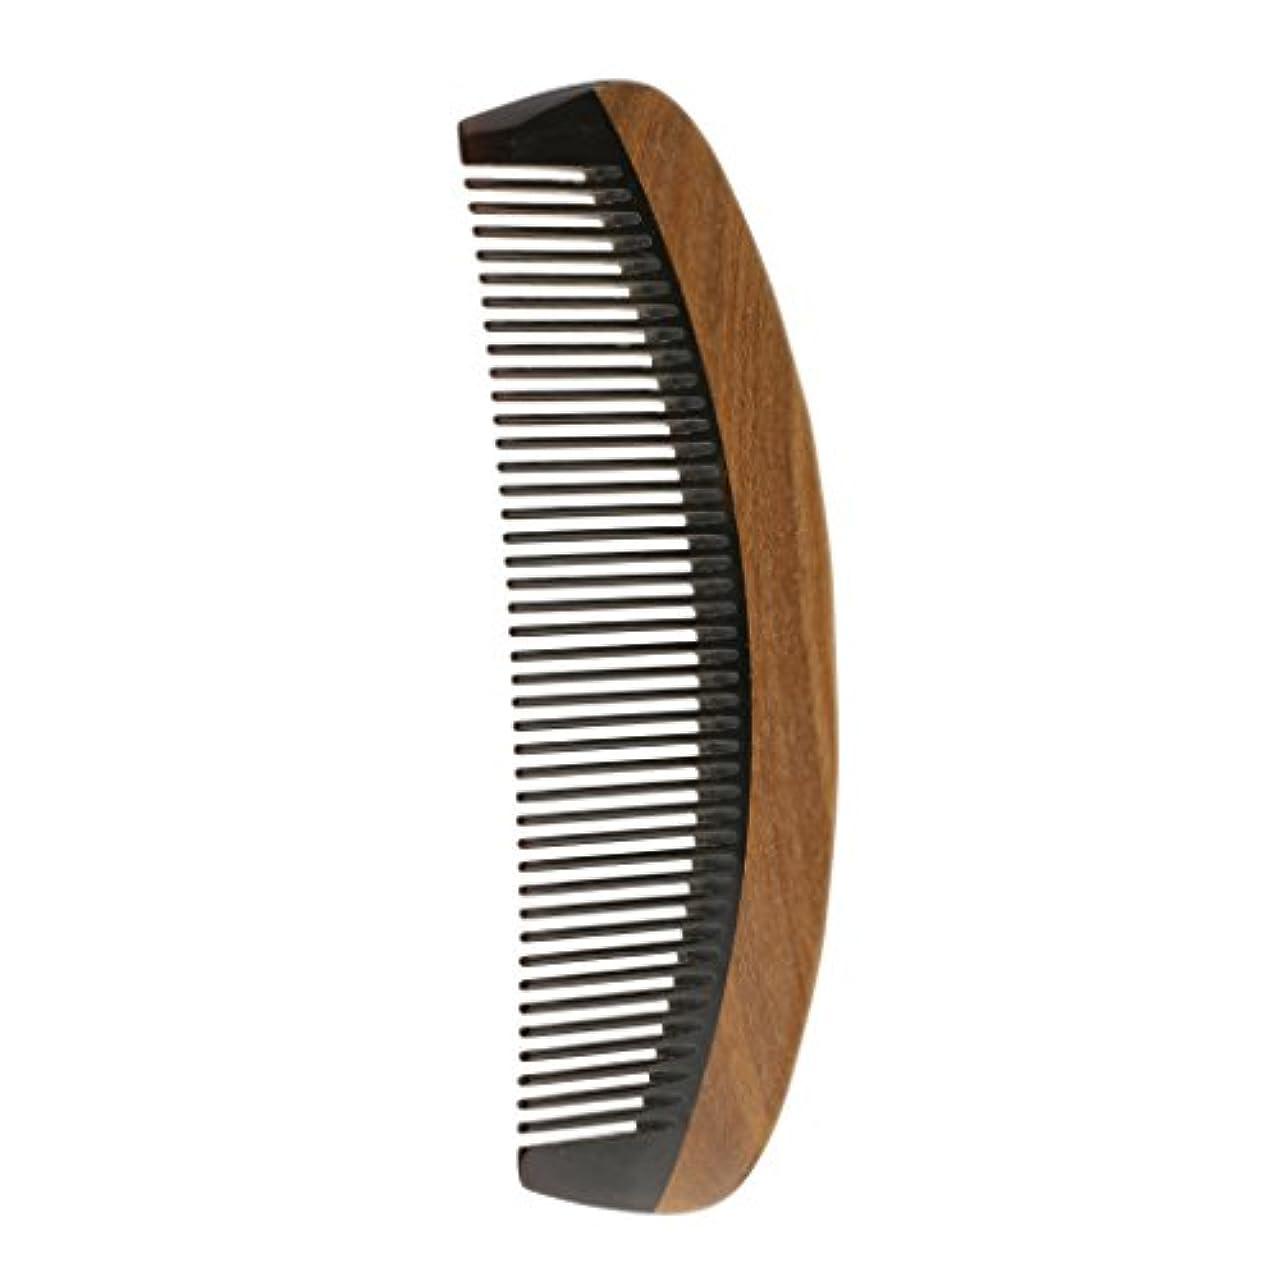 Baosity ウッドコーム 木製 ハンドメイド 櫛 静電気防止 高品質 マッサージ